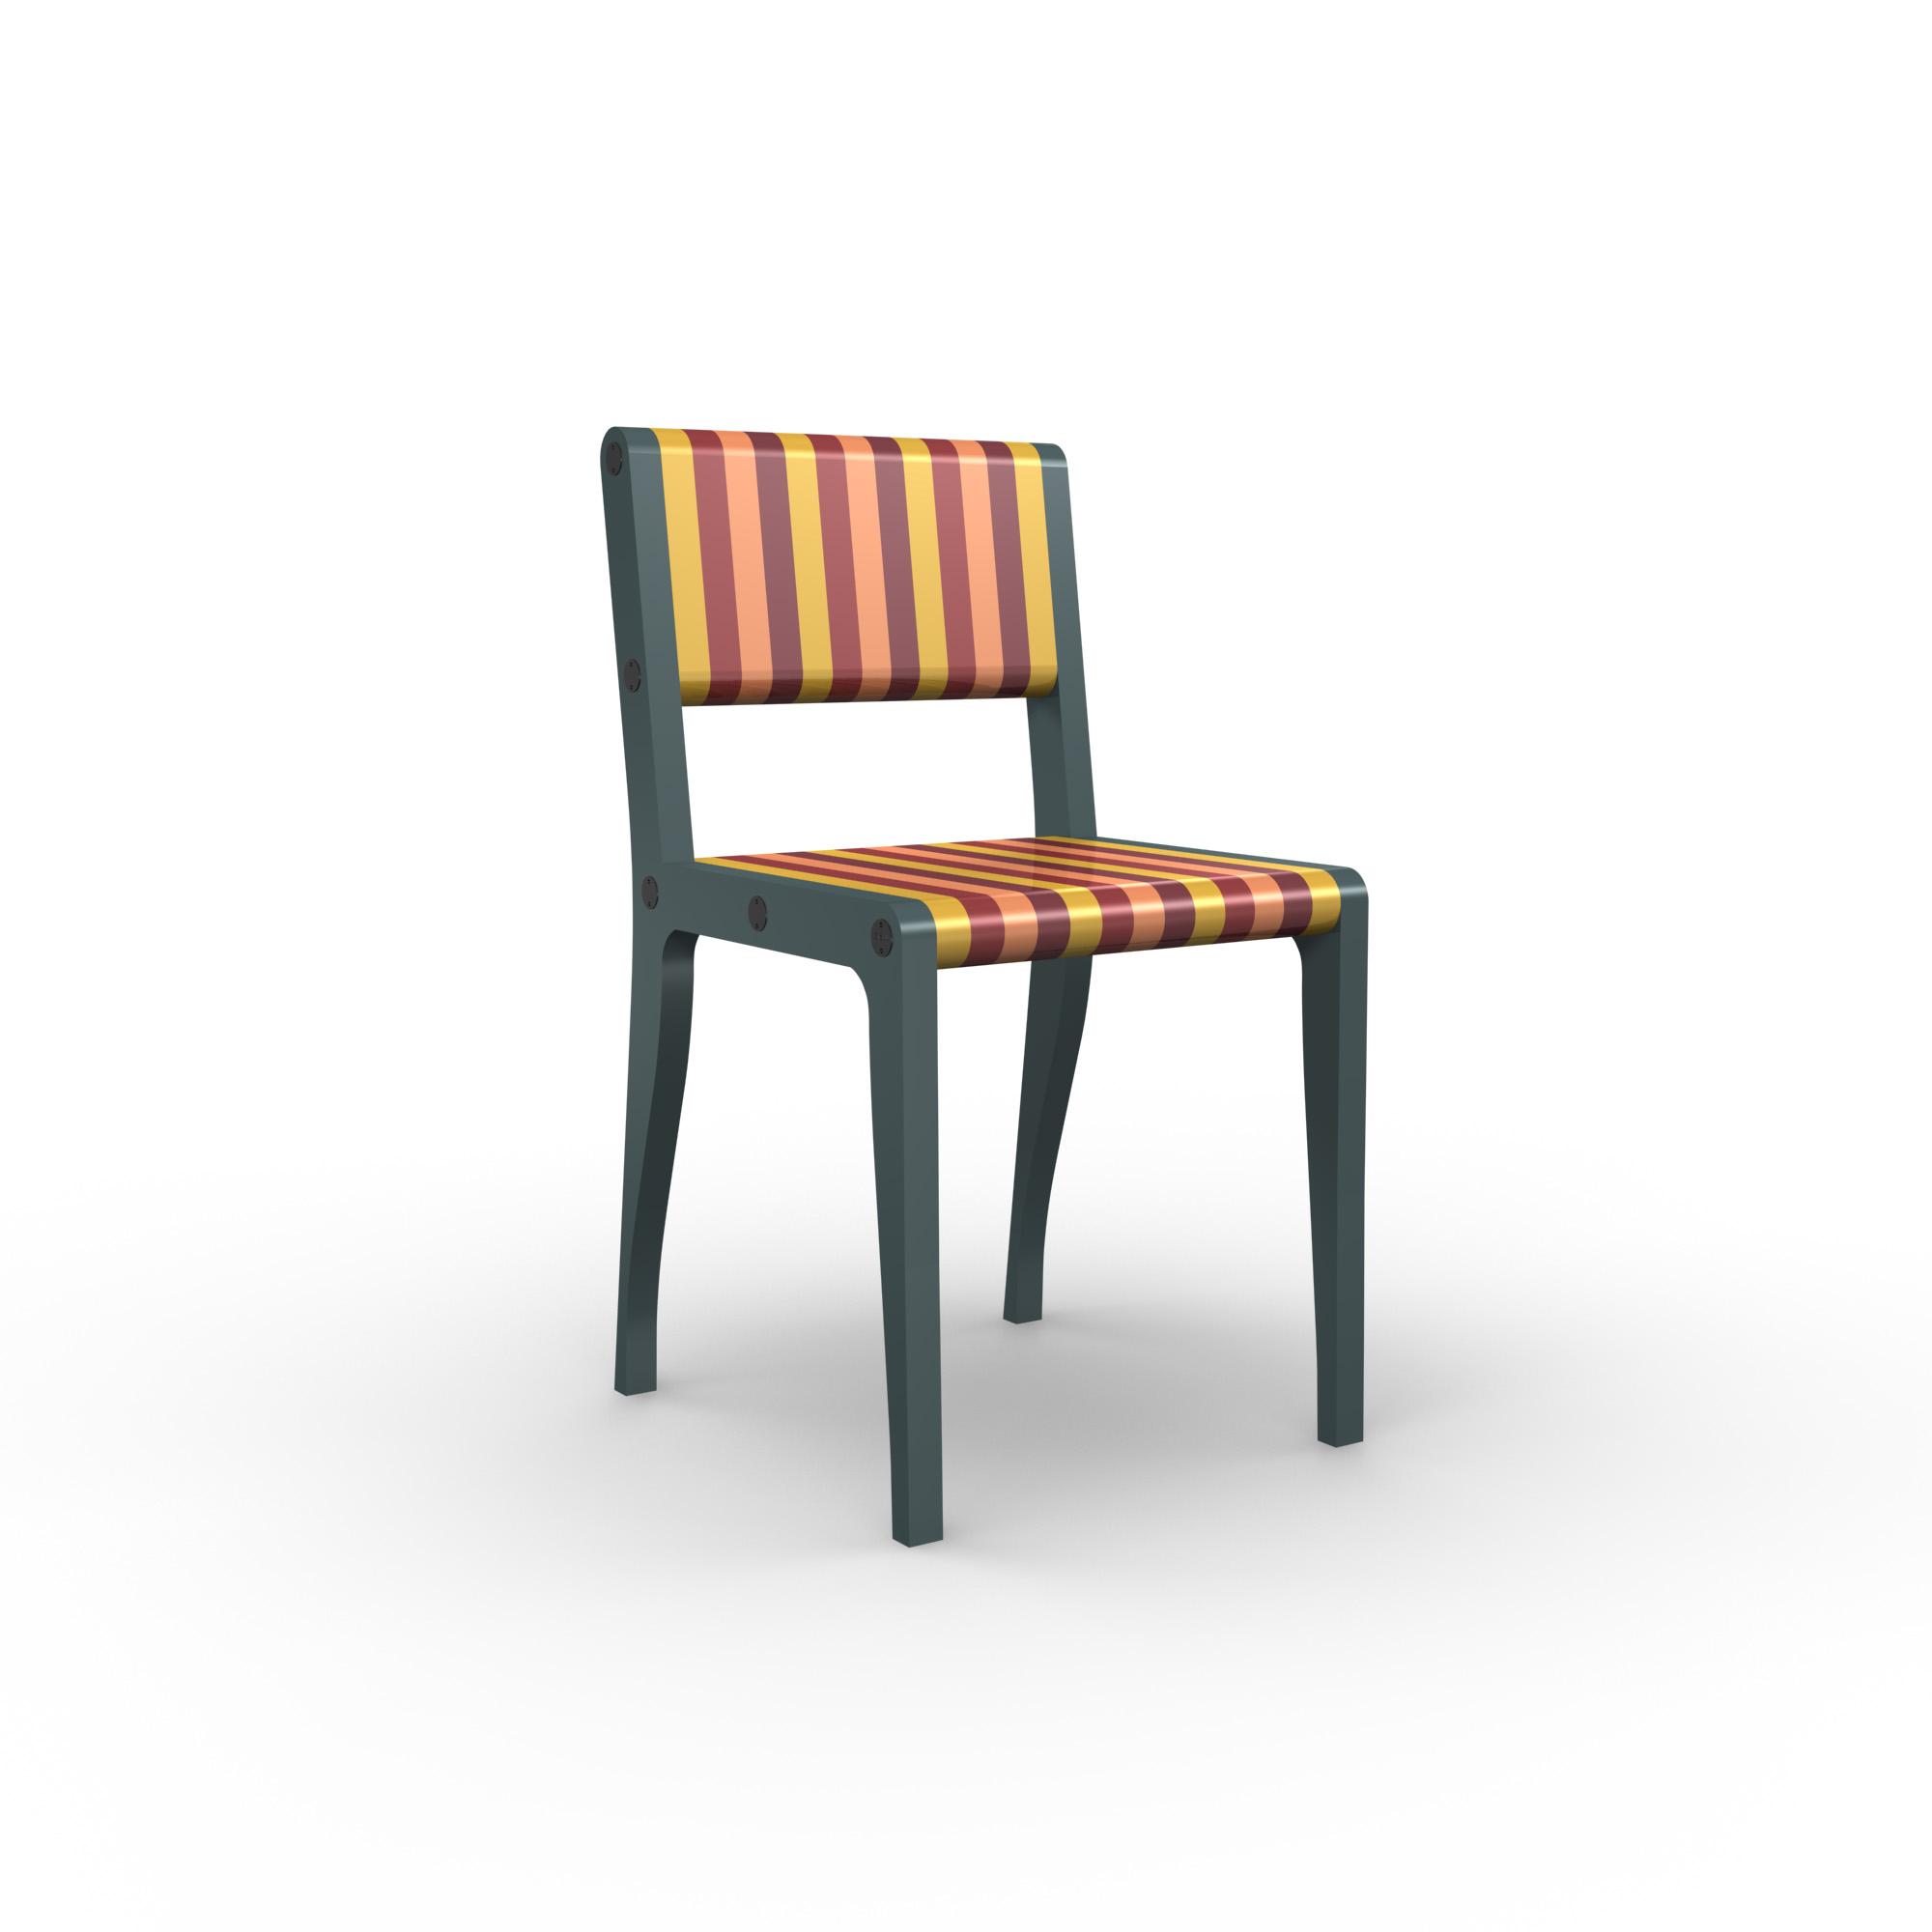 diseño industrial santander - Beusual - Sirak - silla aula